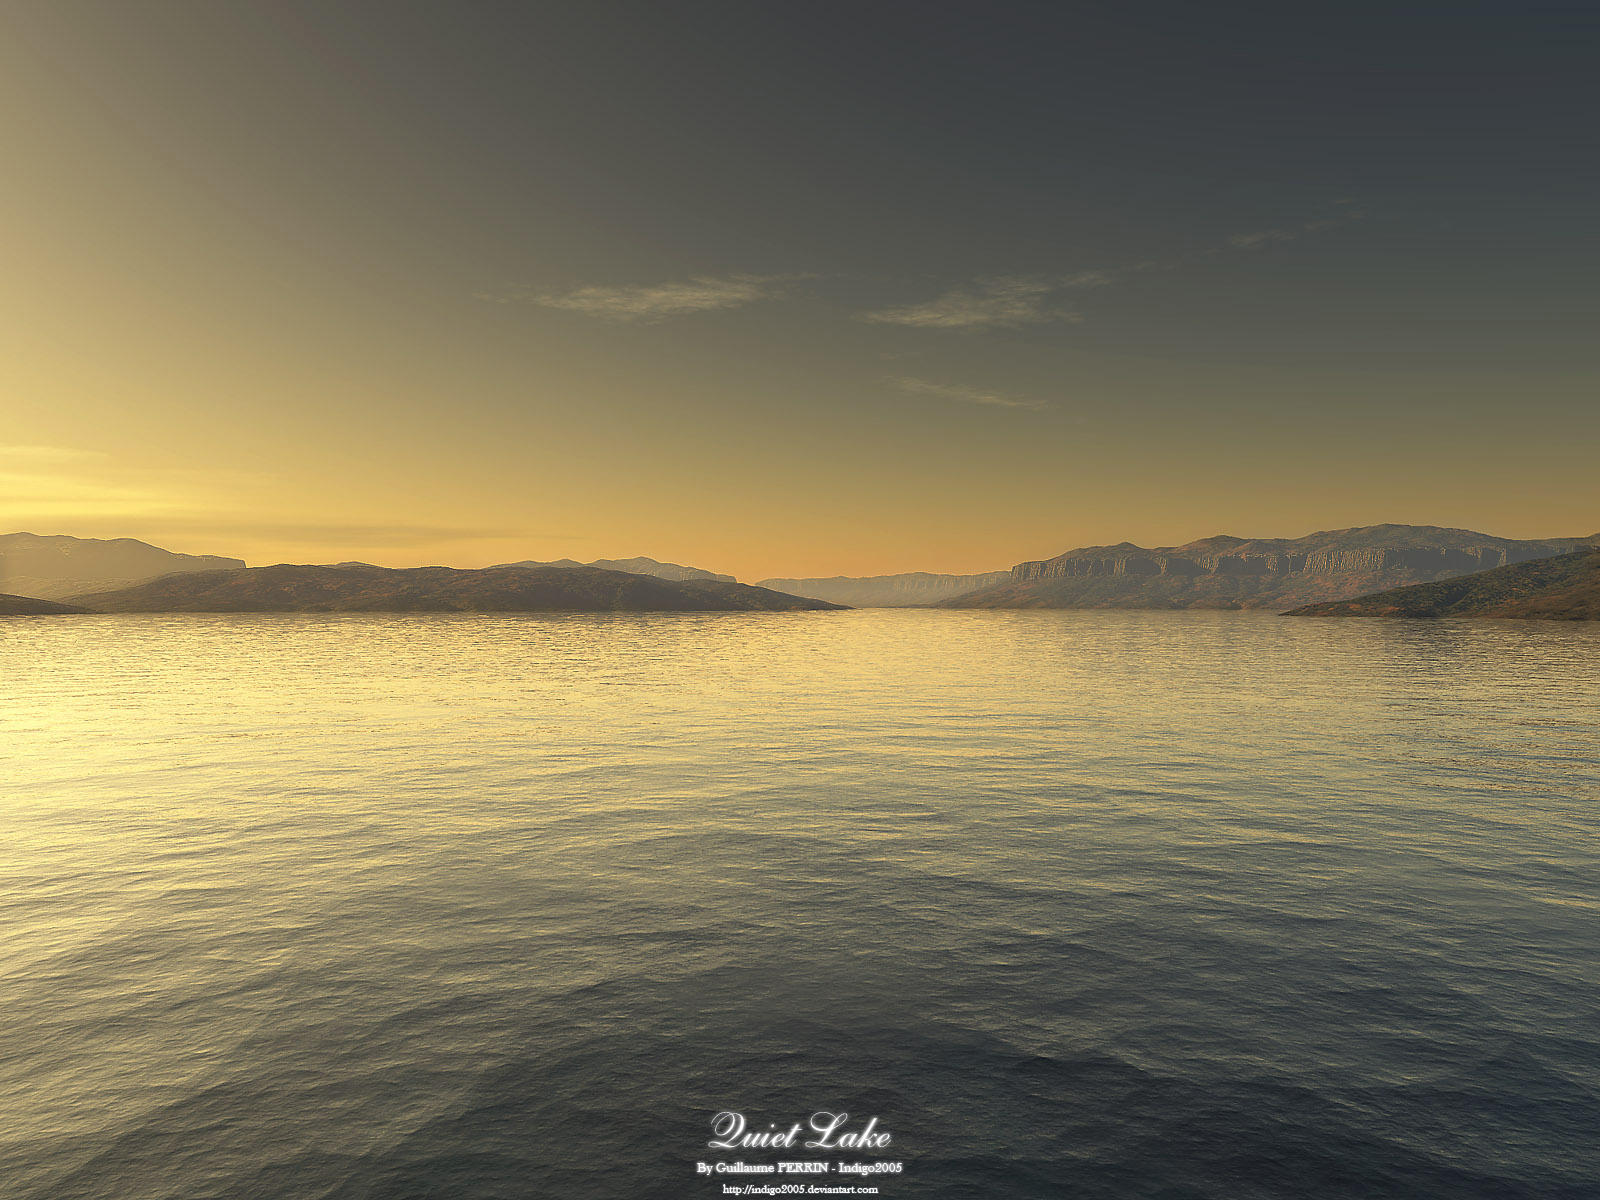 Quiet Lake by Indigo2005